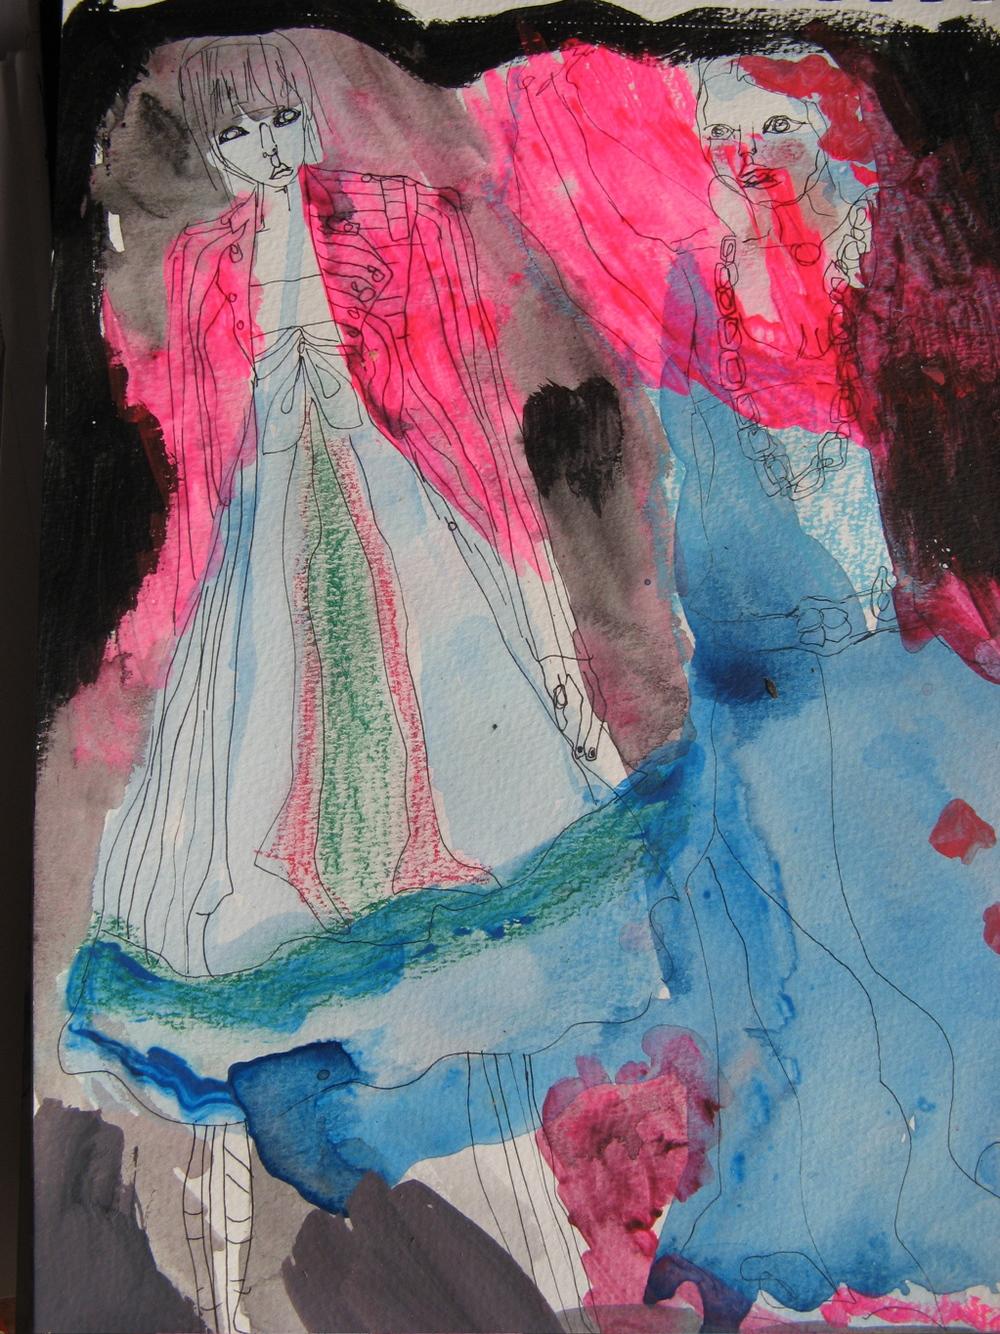 "Fashion Violation #2, mixed media on glass frame, 14x12"", 2005-8"